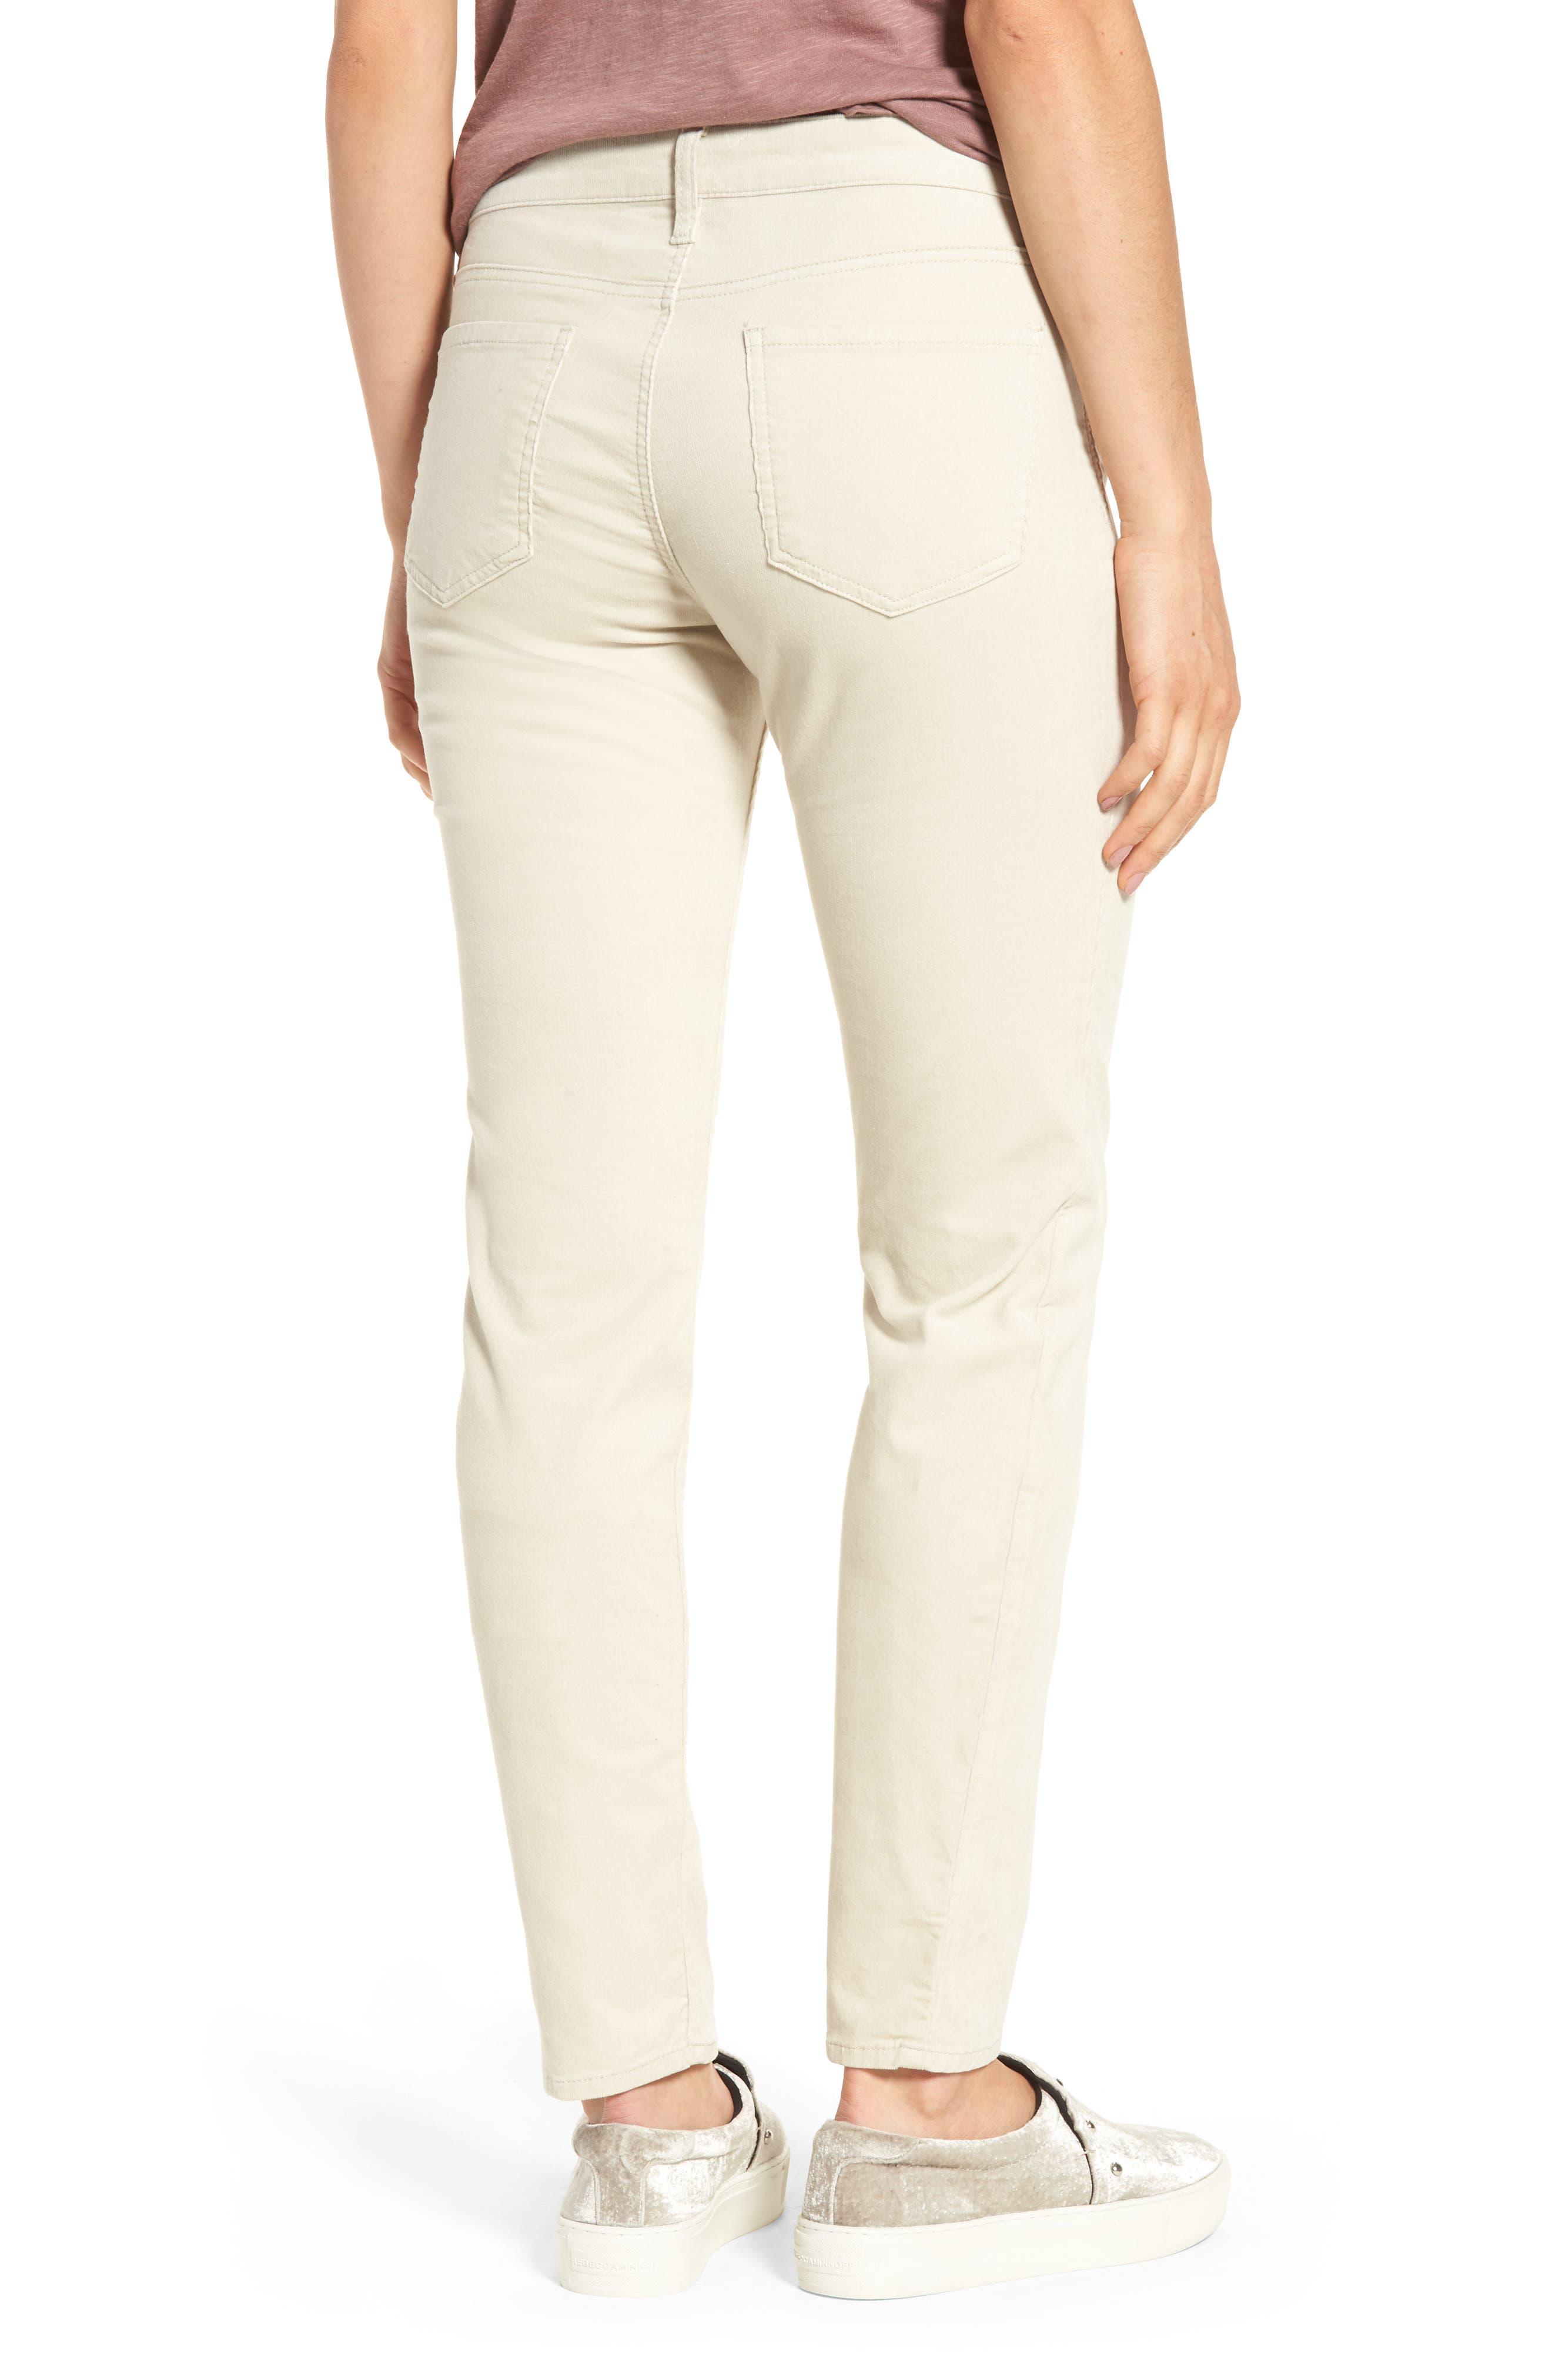 Diana Stretch Corduroy Skinny Pants,                             Alternate thumbnail 2, color,                             Light Tan 2